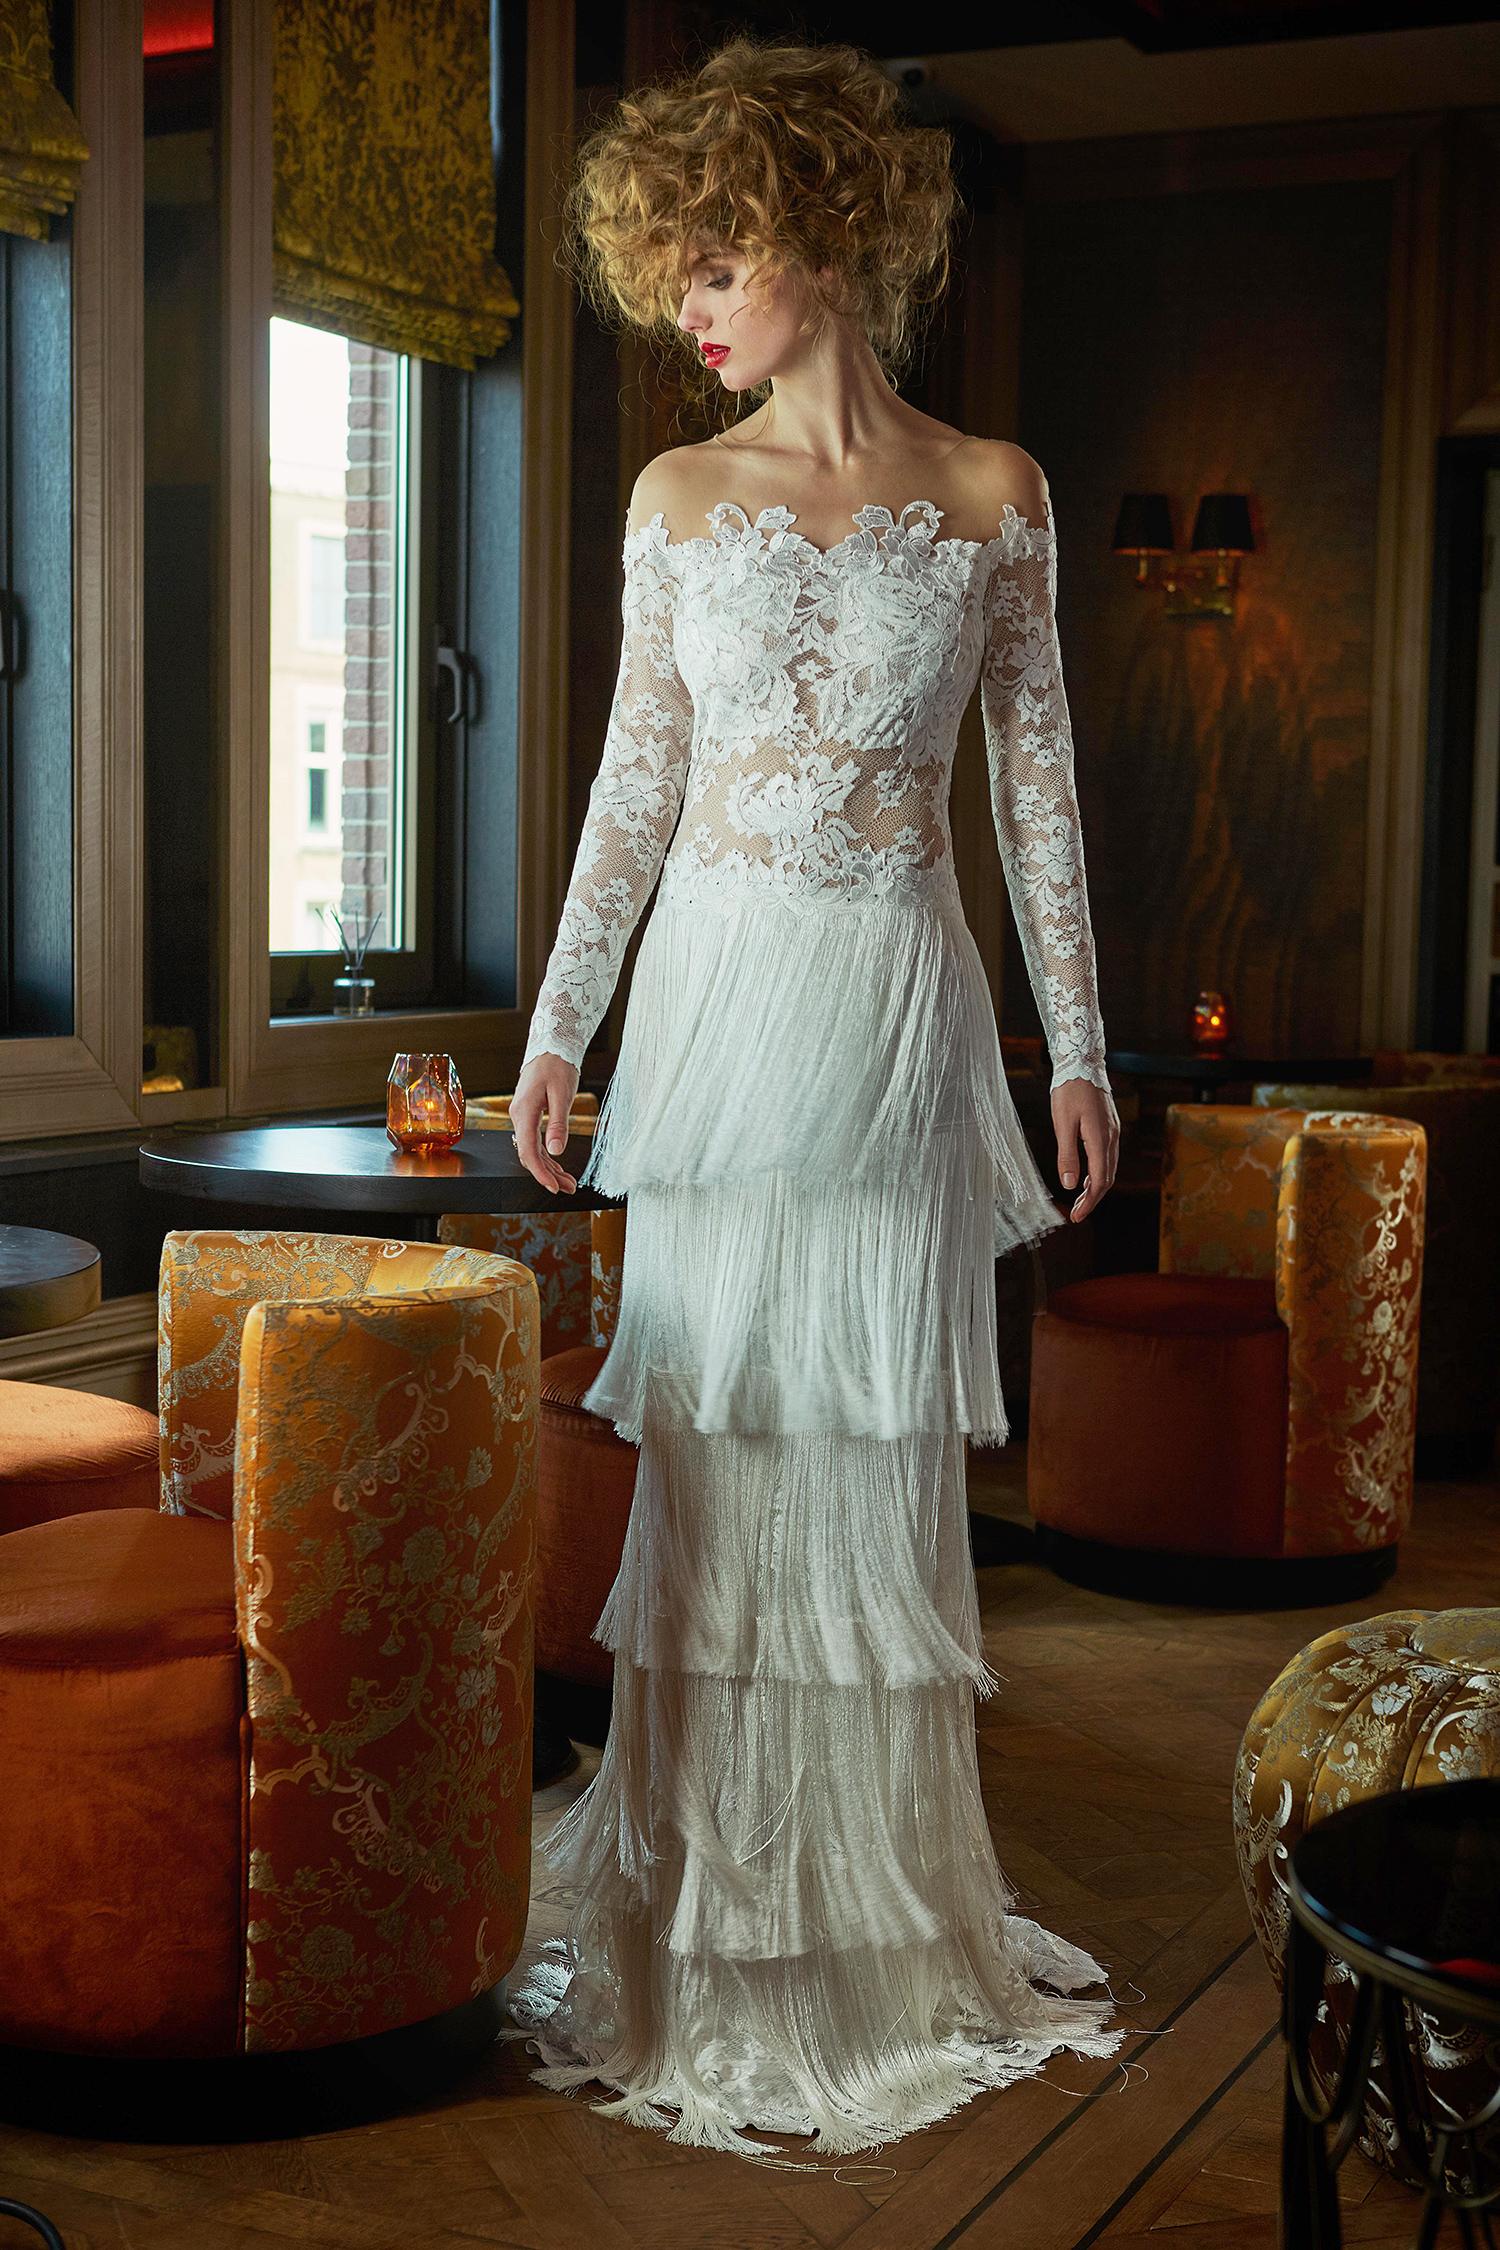 olvi wedding dress spring 2019 off-the-shoulder long sleeves fringed skirt